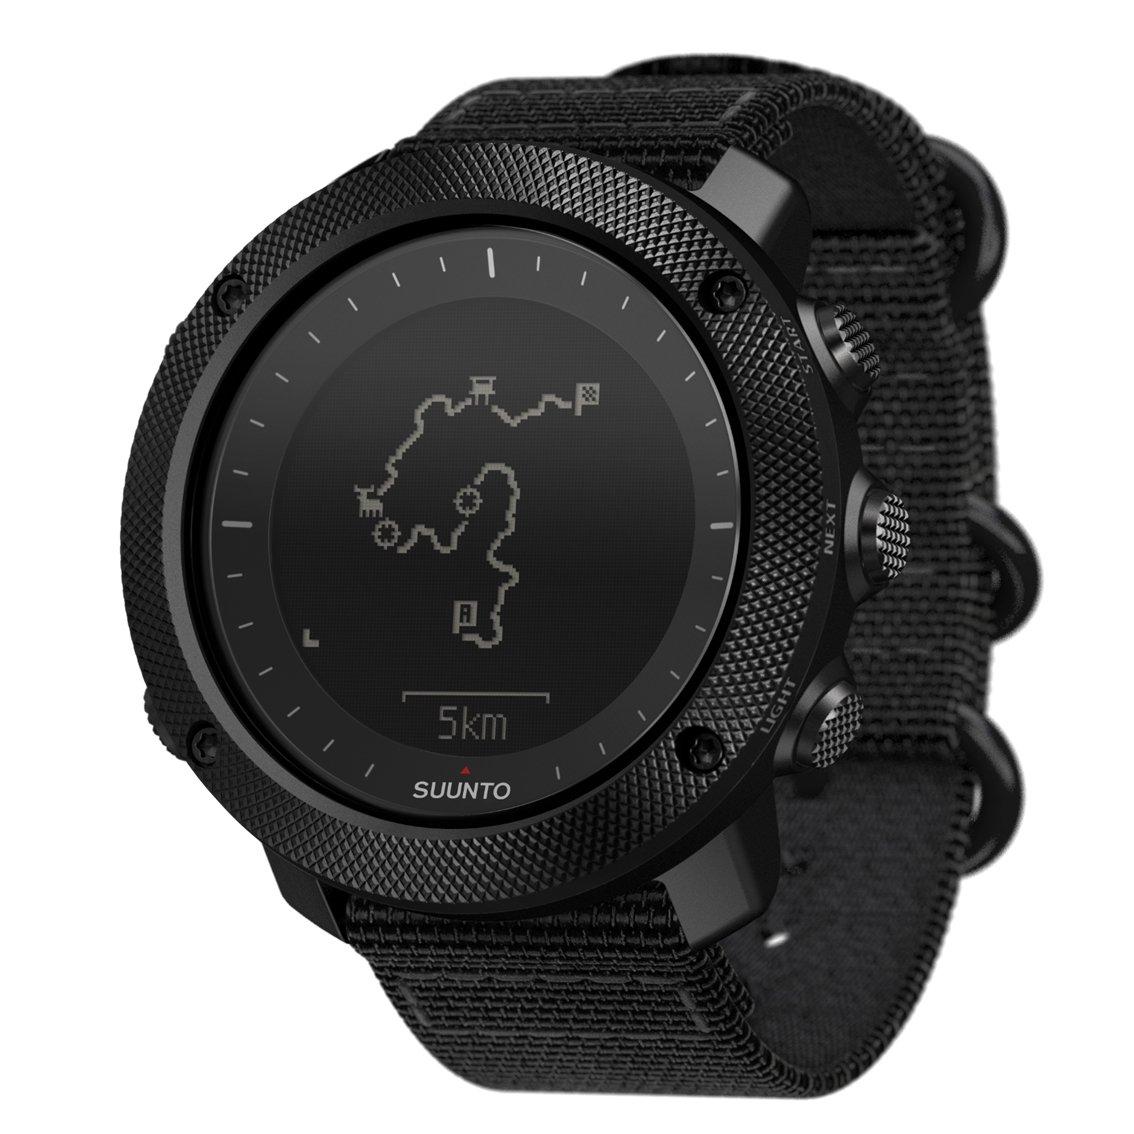 SUUNTO TRAVERSE ALPHA (スント トラバース アルファ) スマートウォッチ GPS 登山 気圧計 [日本正規品] B01DNSDBDS  ステルス